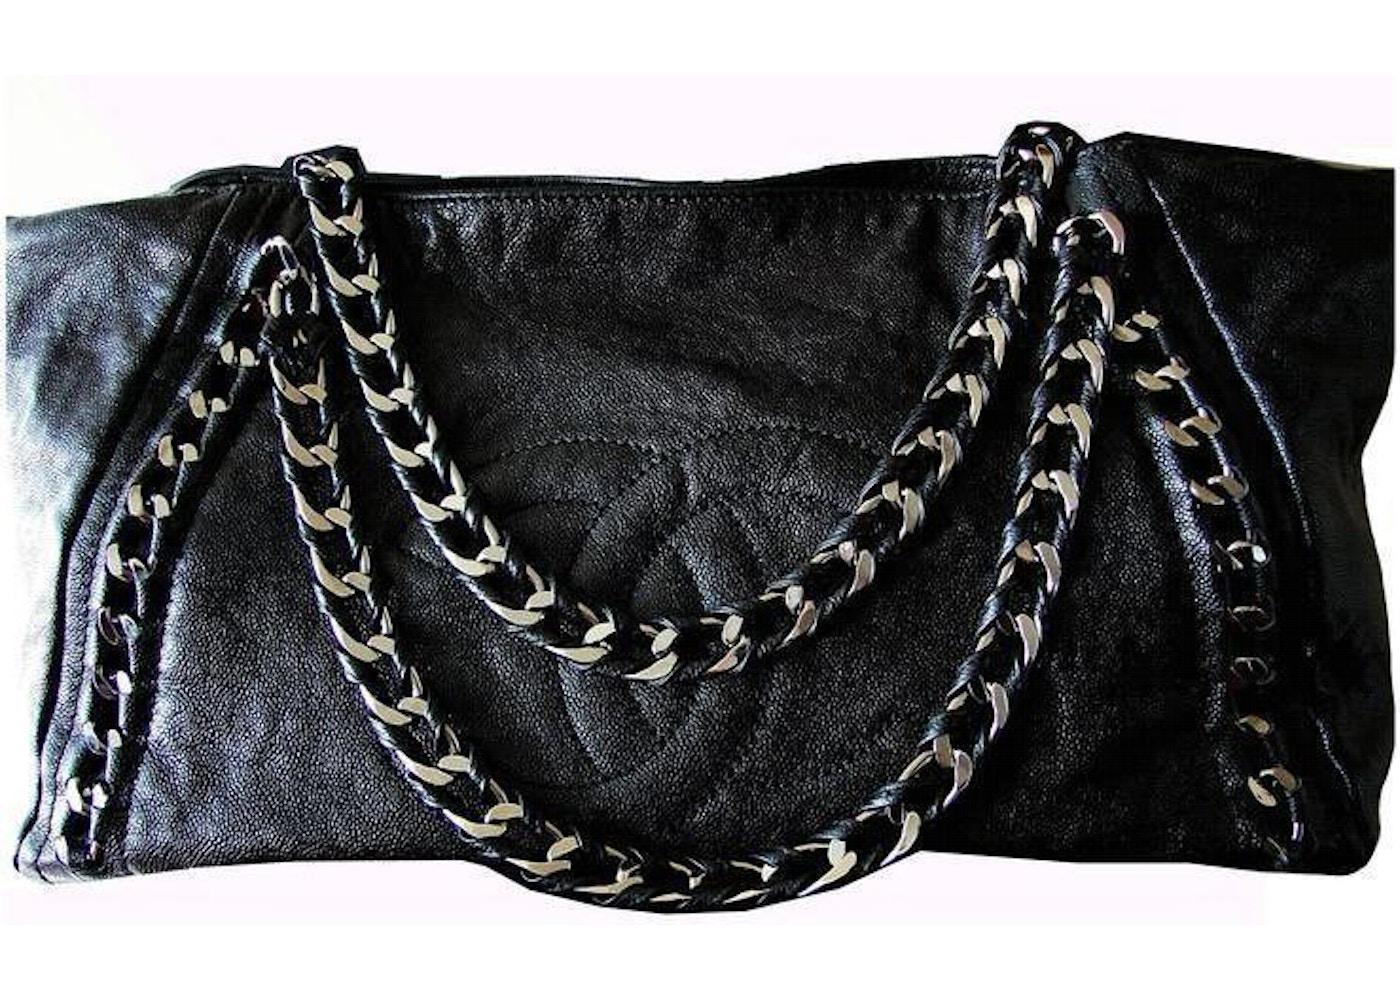 3050d5305f98 Chanel East West Tote Modern Chain Glazed XL Black